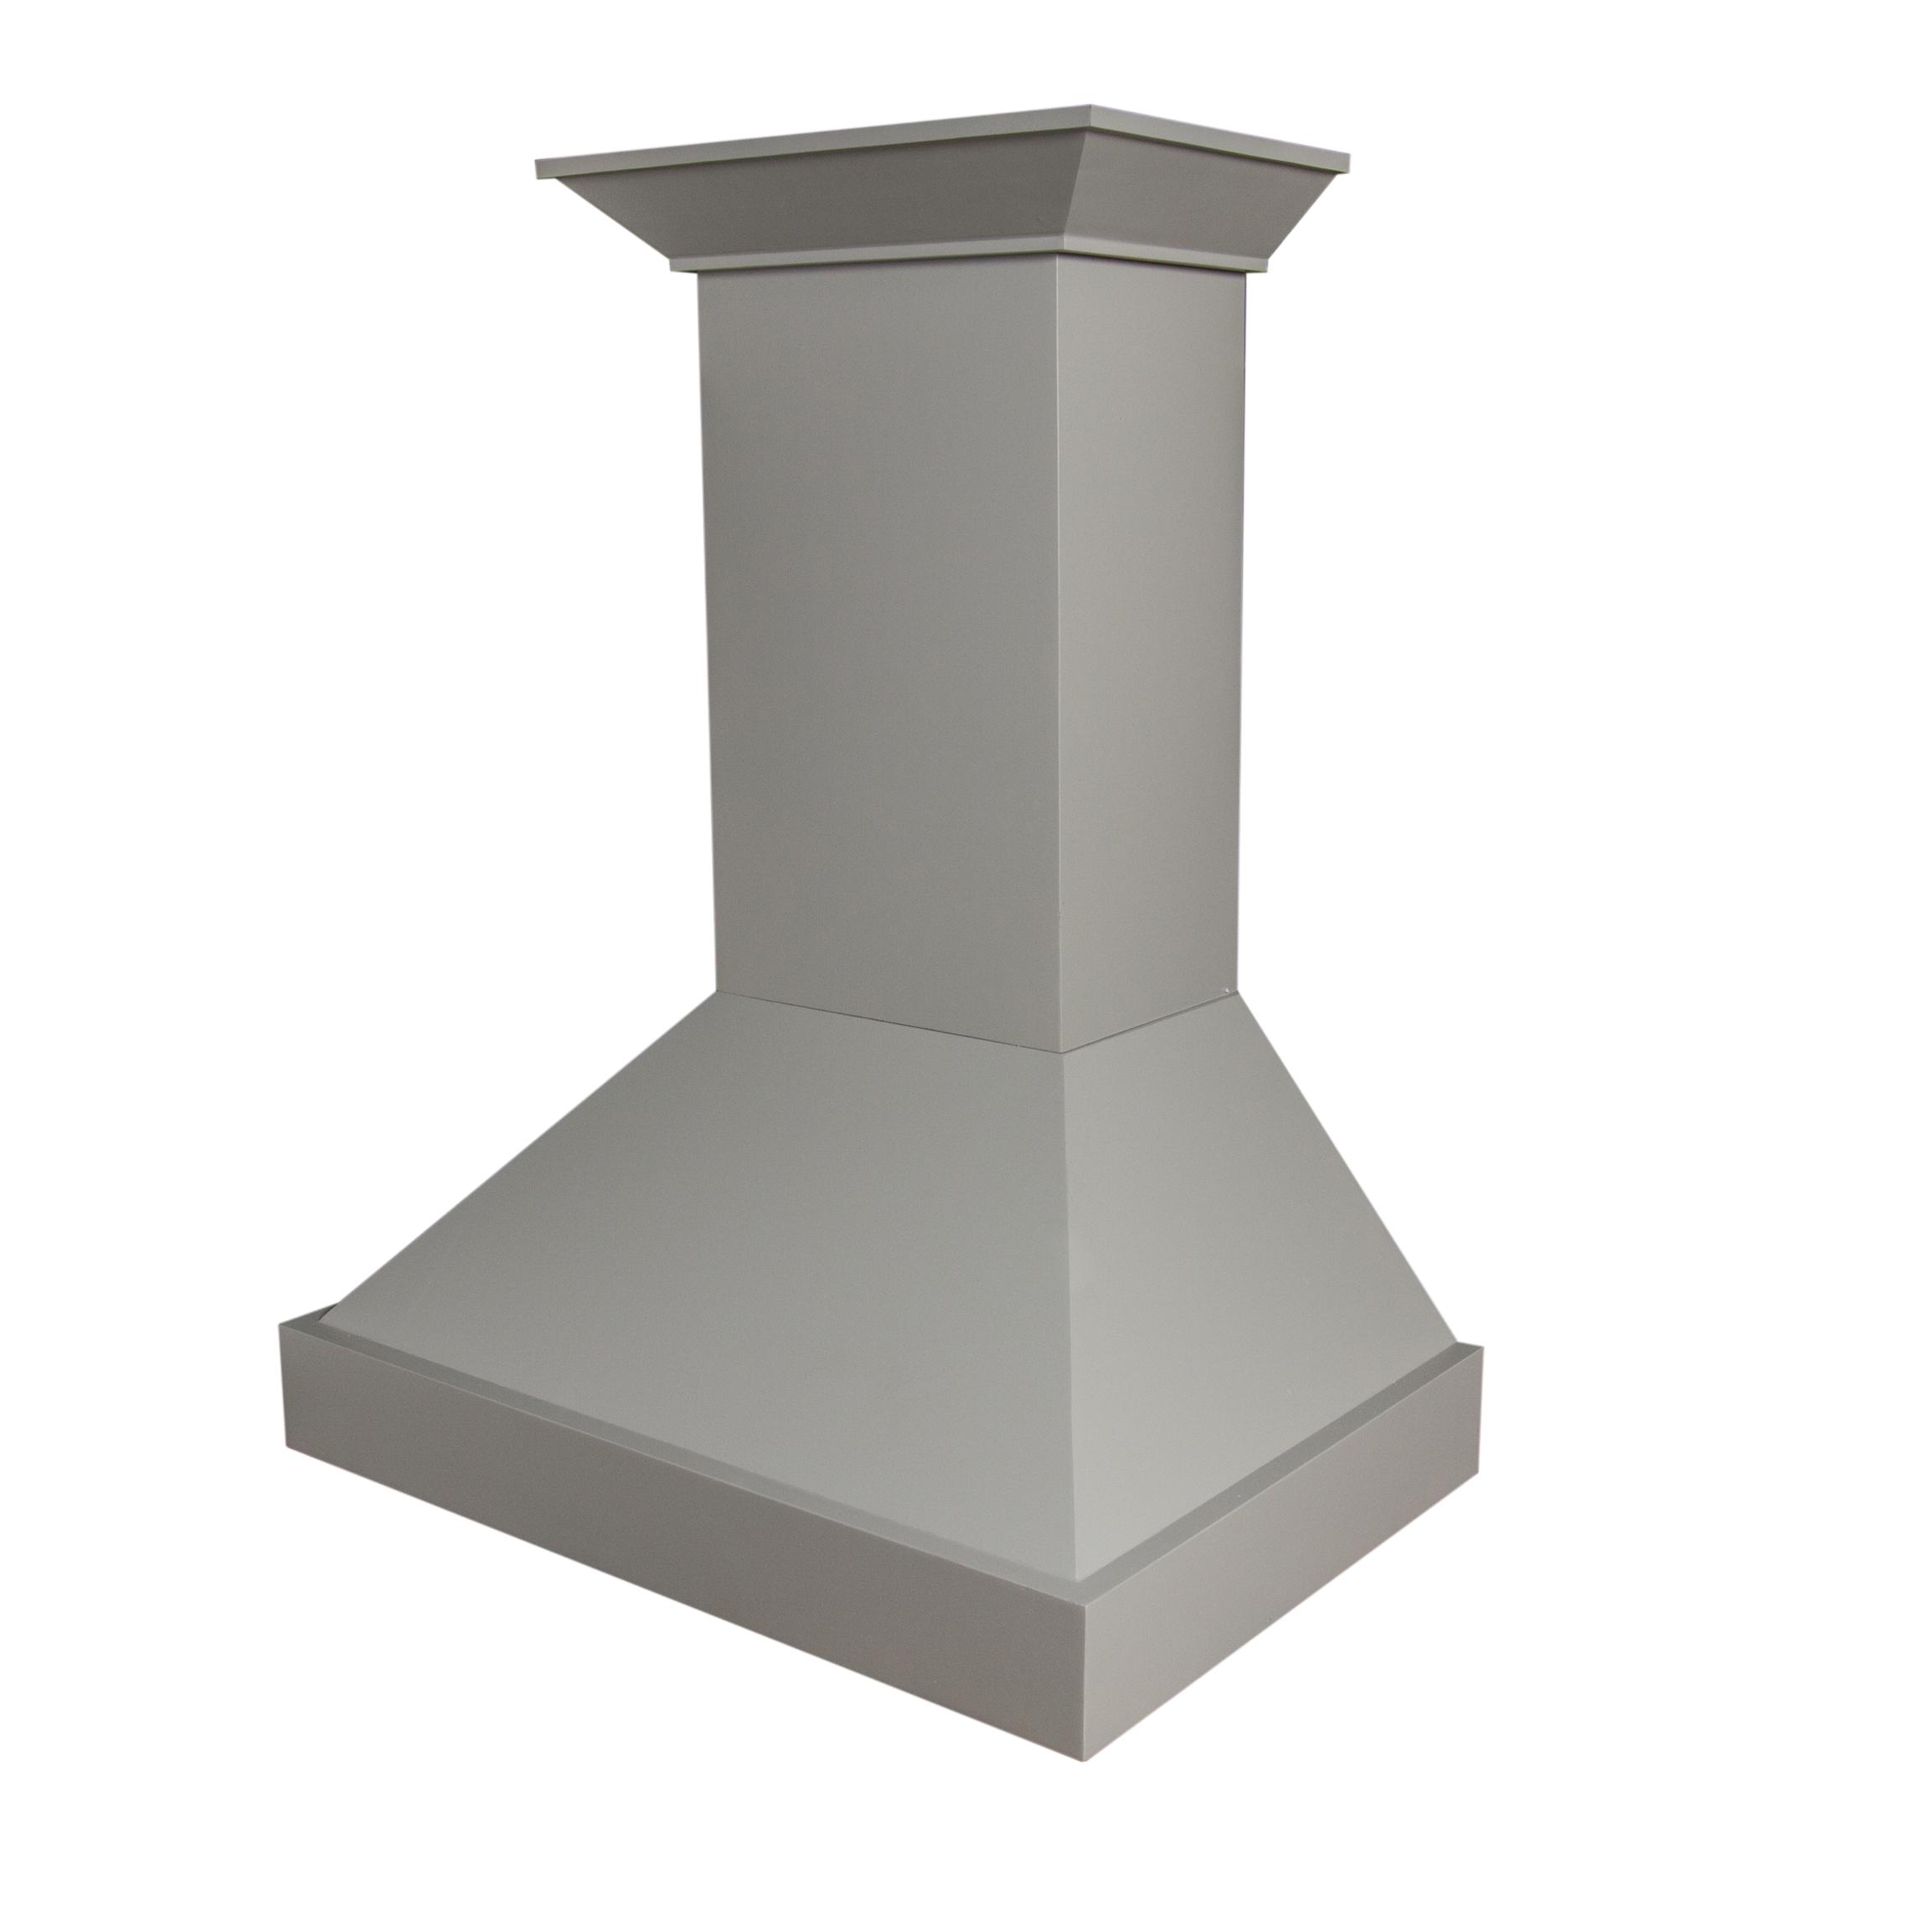 zline-designer-wood-range-hood-KBUU-main.jpg